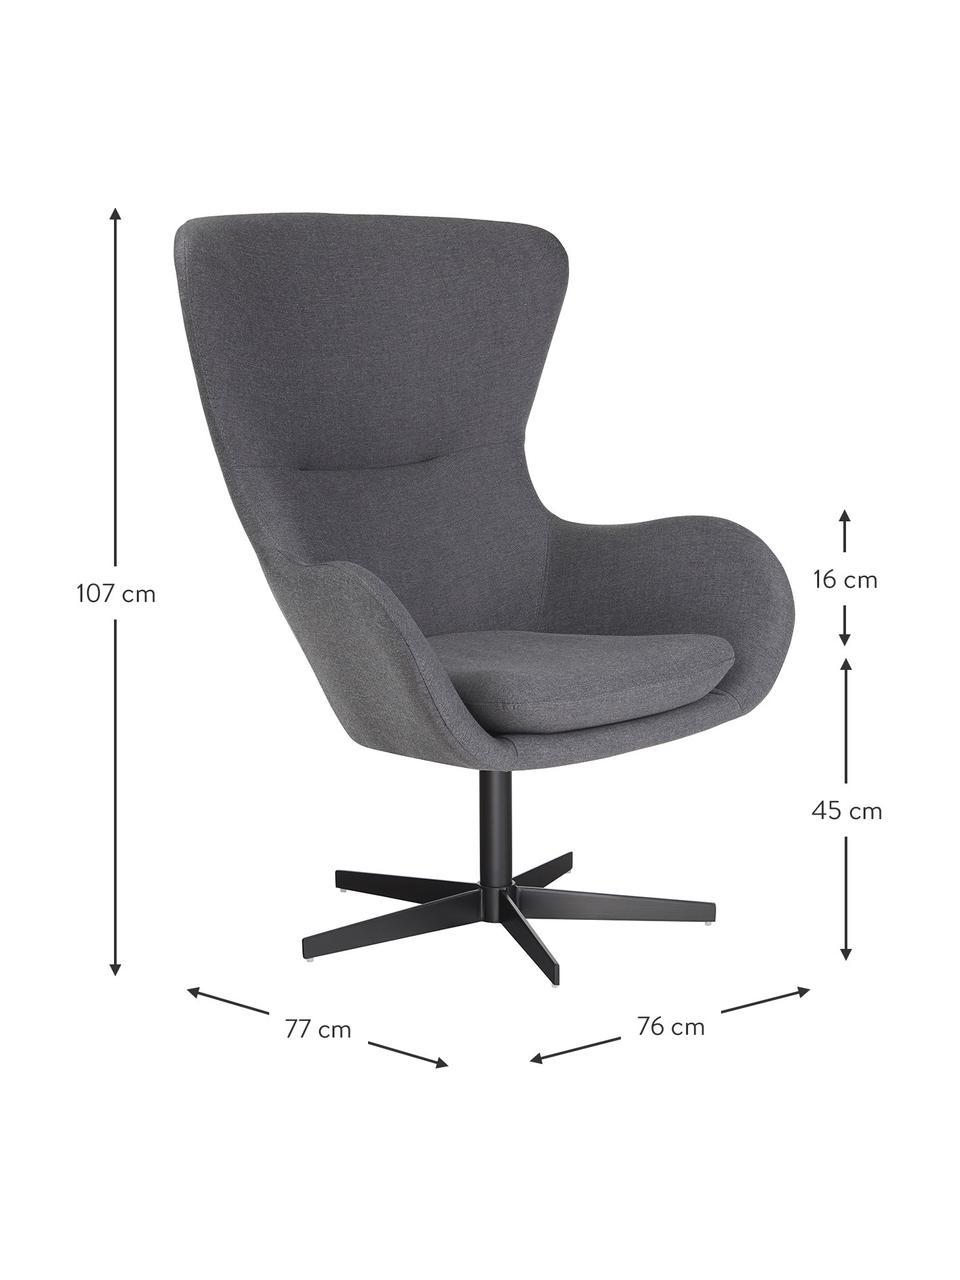 Drehbarer Ohrensessel Wing in Grau, Bezug: 93% Polyester, 5% Baumwol, Füße: Metall, pulverbeschichtet, Webstoff Grau, B 76 x T 77 cm